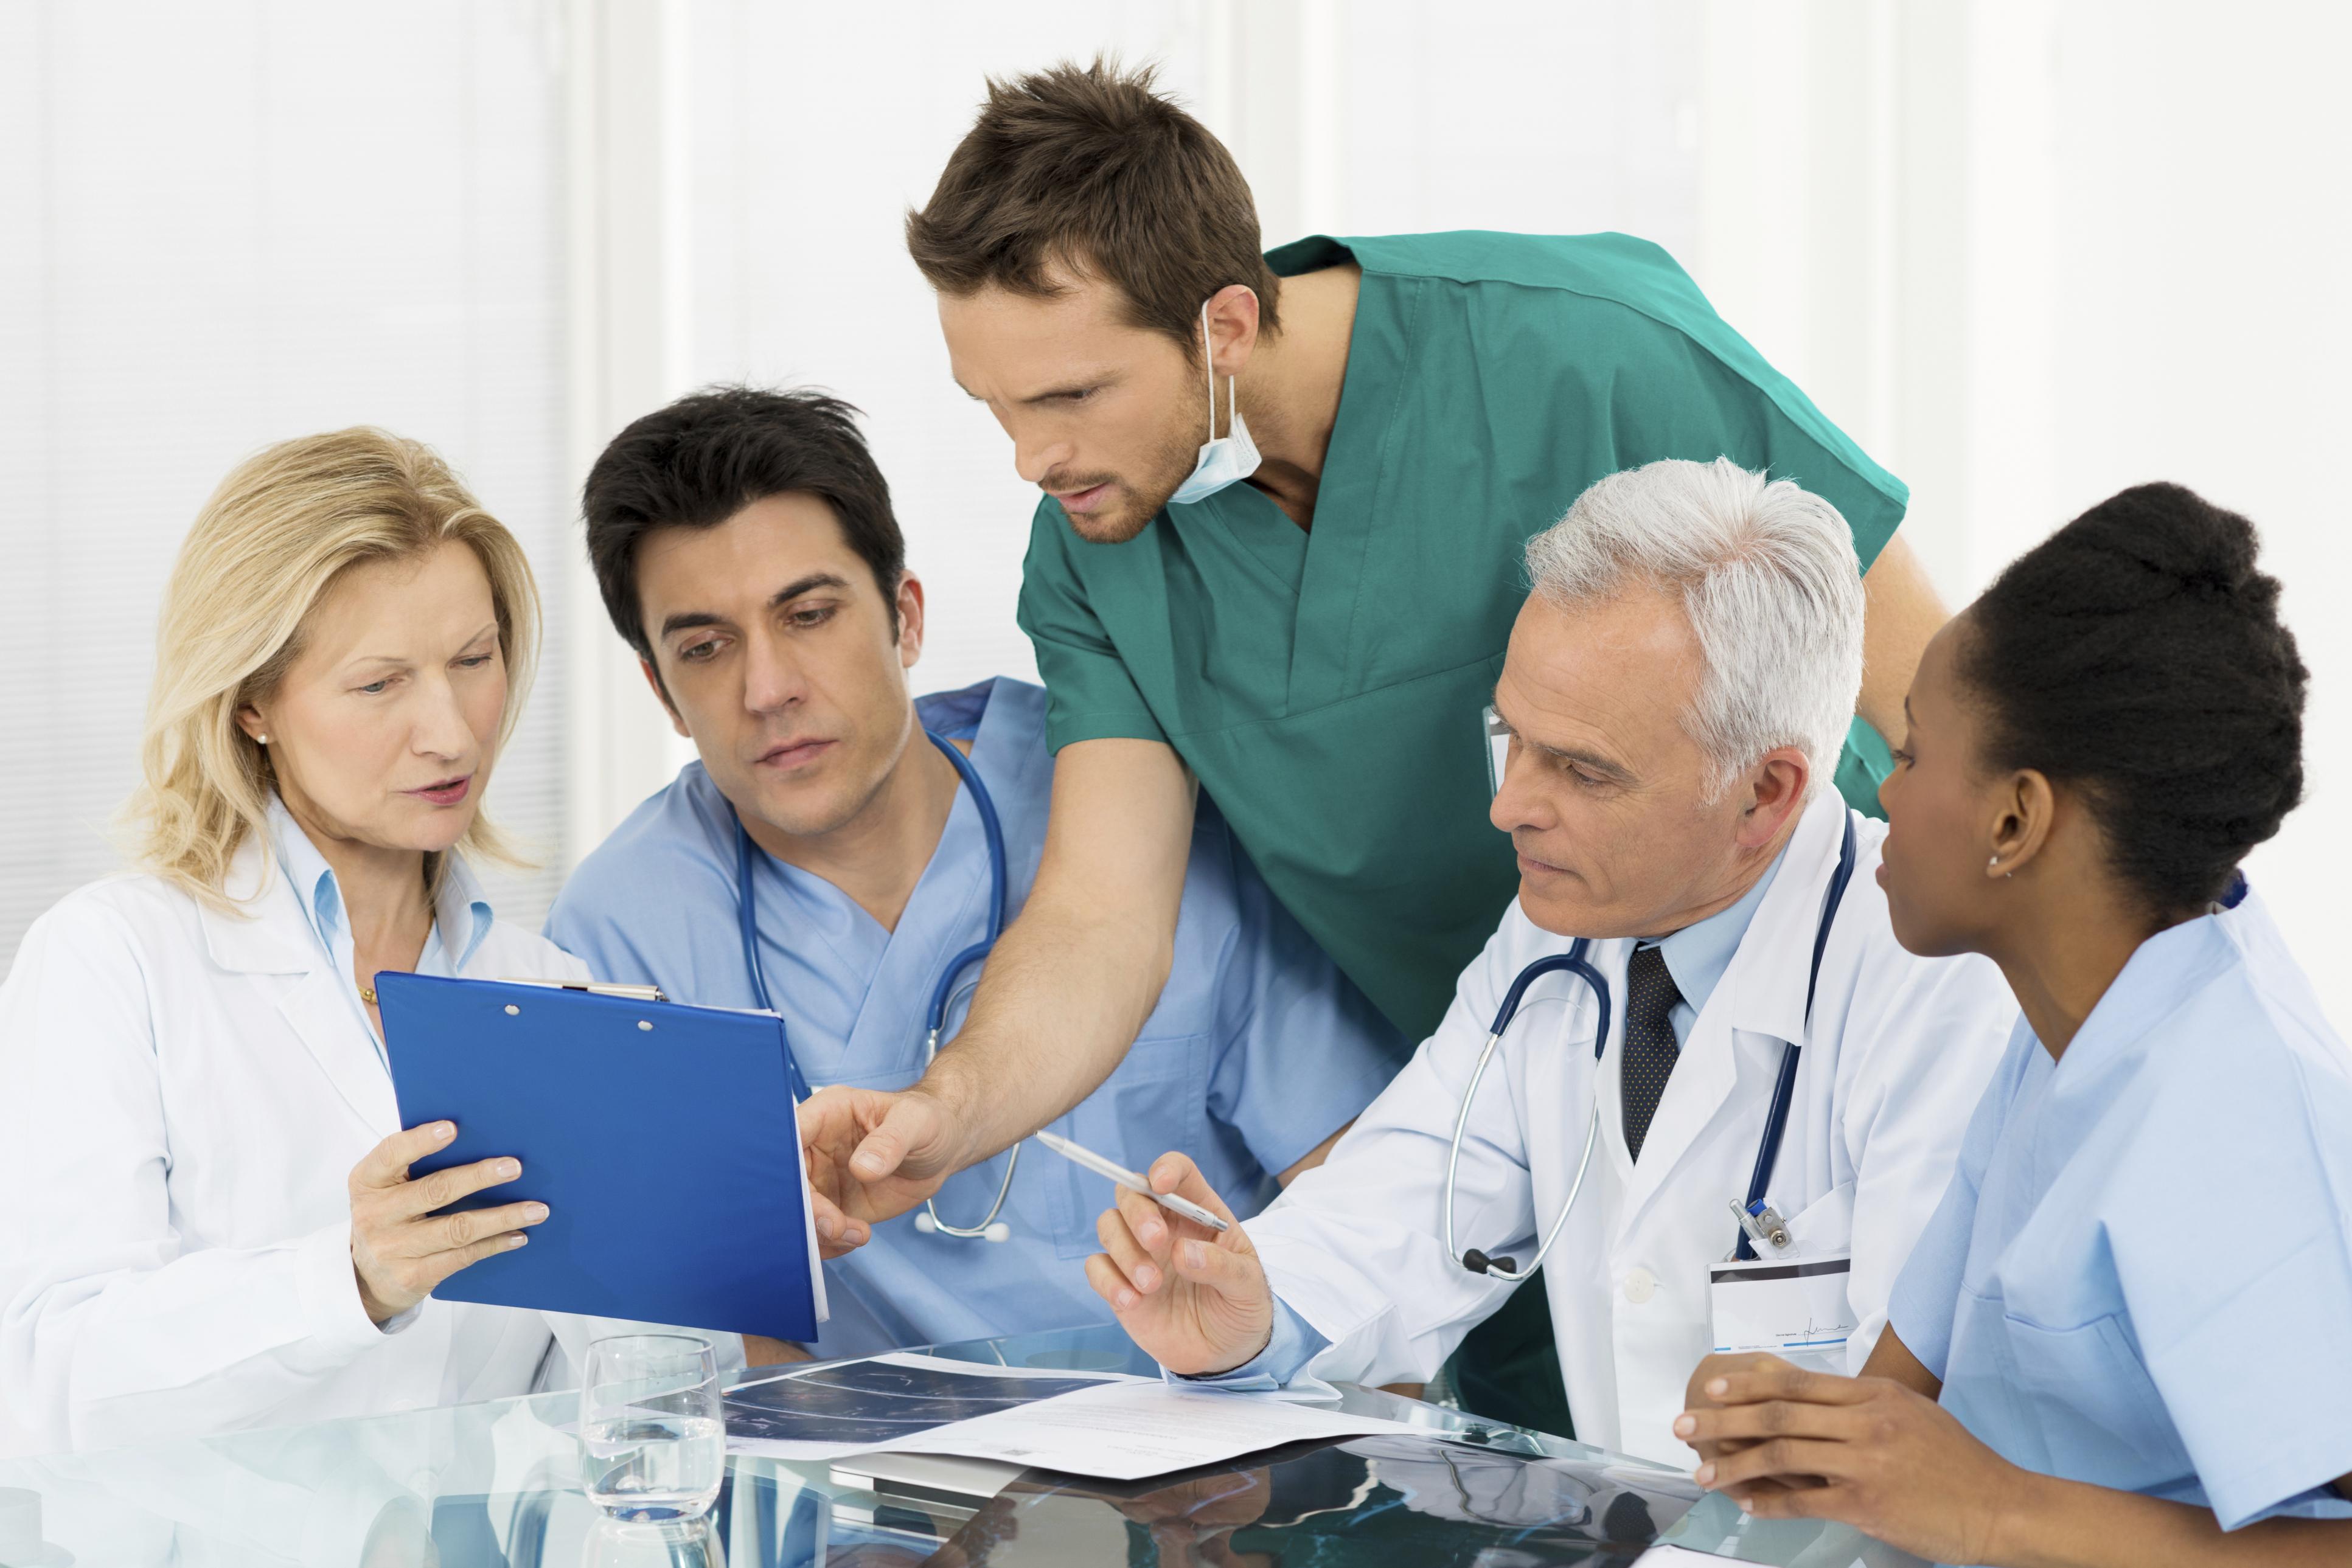 EMPLOYMENT OPPORTUNITIES | KW Urgent Care Clinics